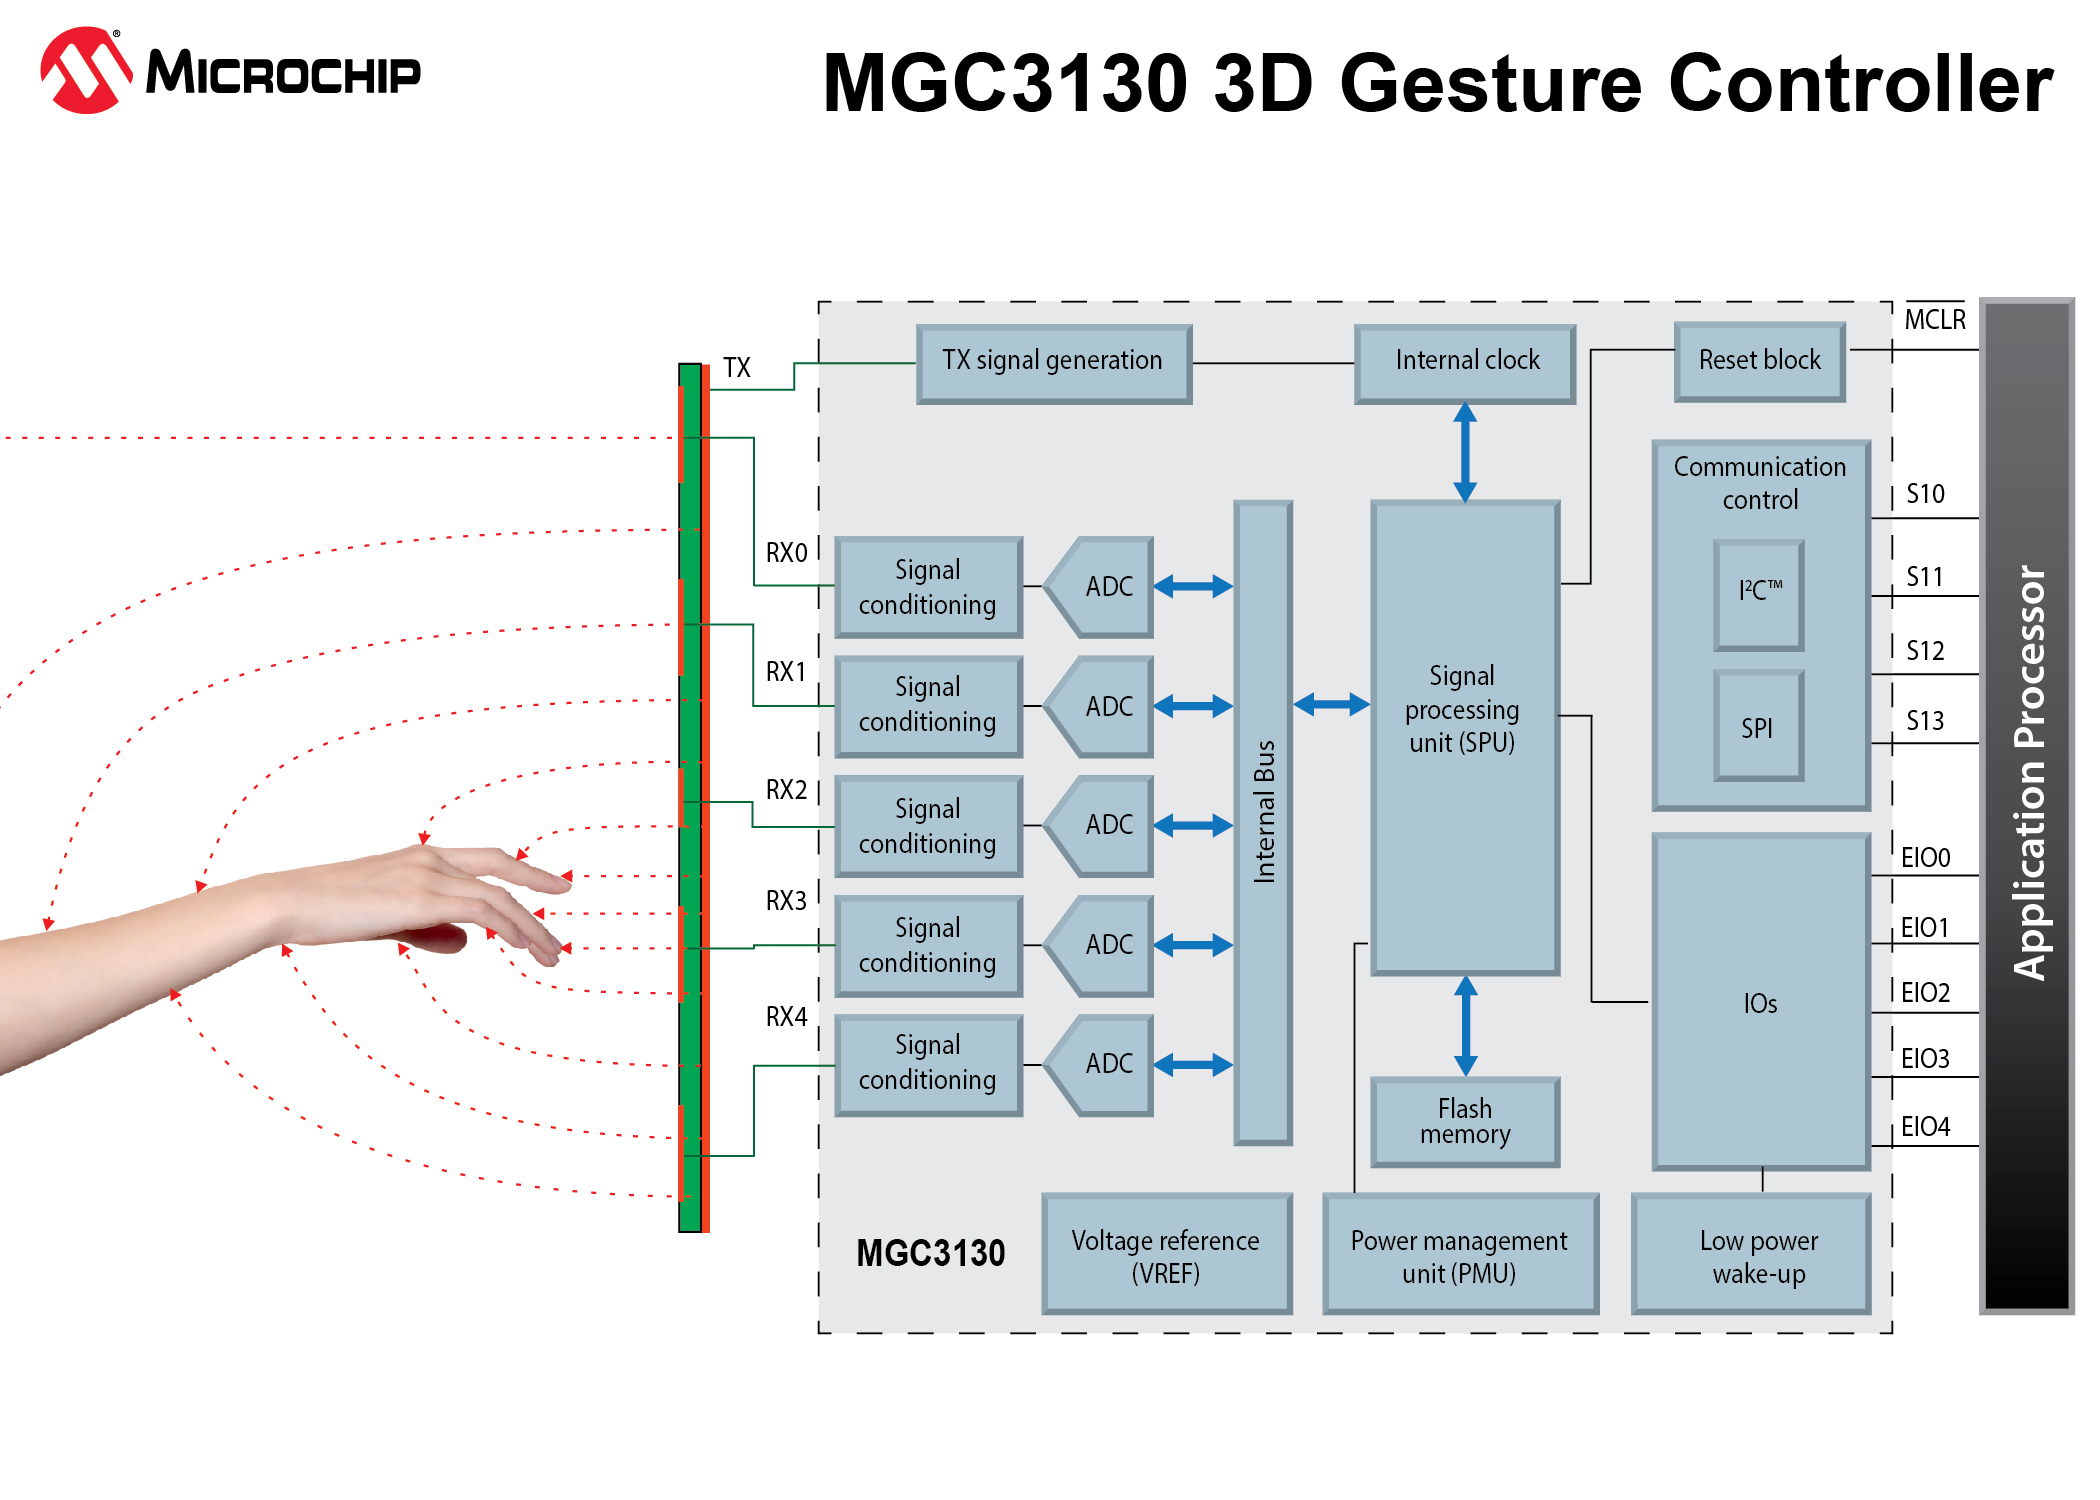 Block diagram of mobile phone   Sony reveals world's highest-resolution phone camera image sensor